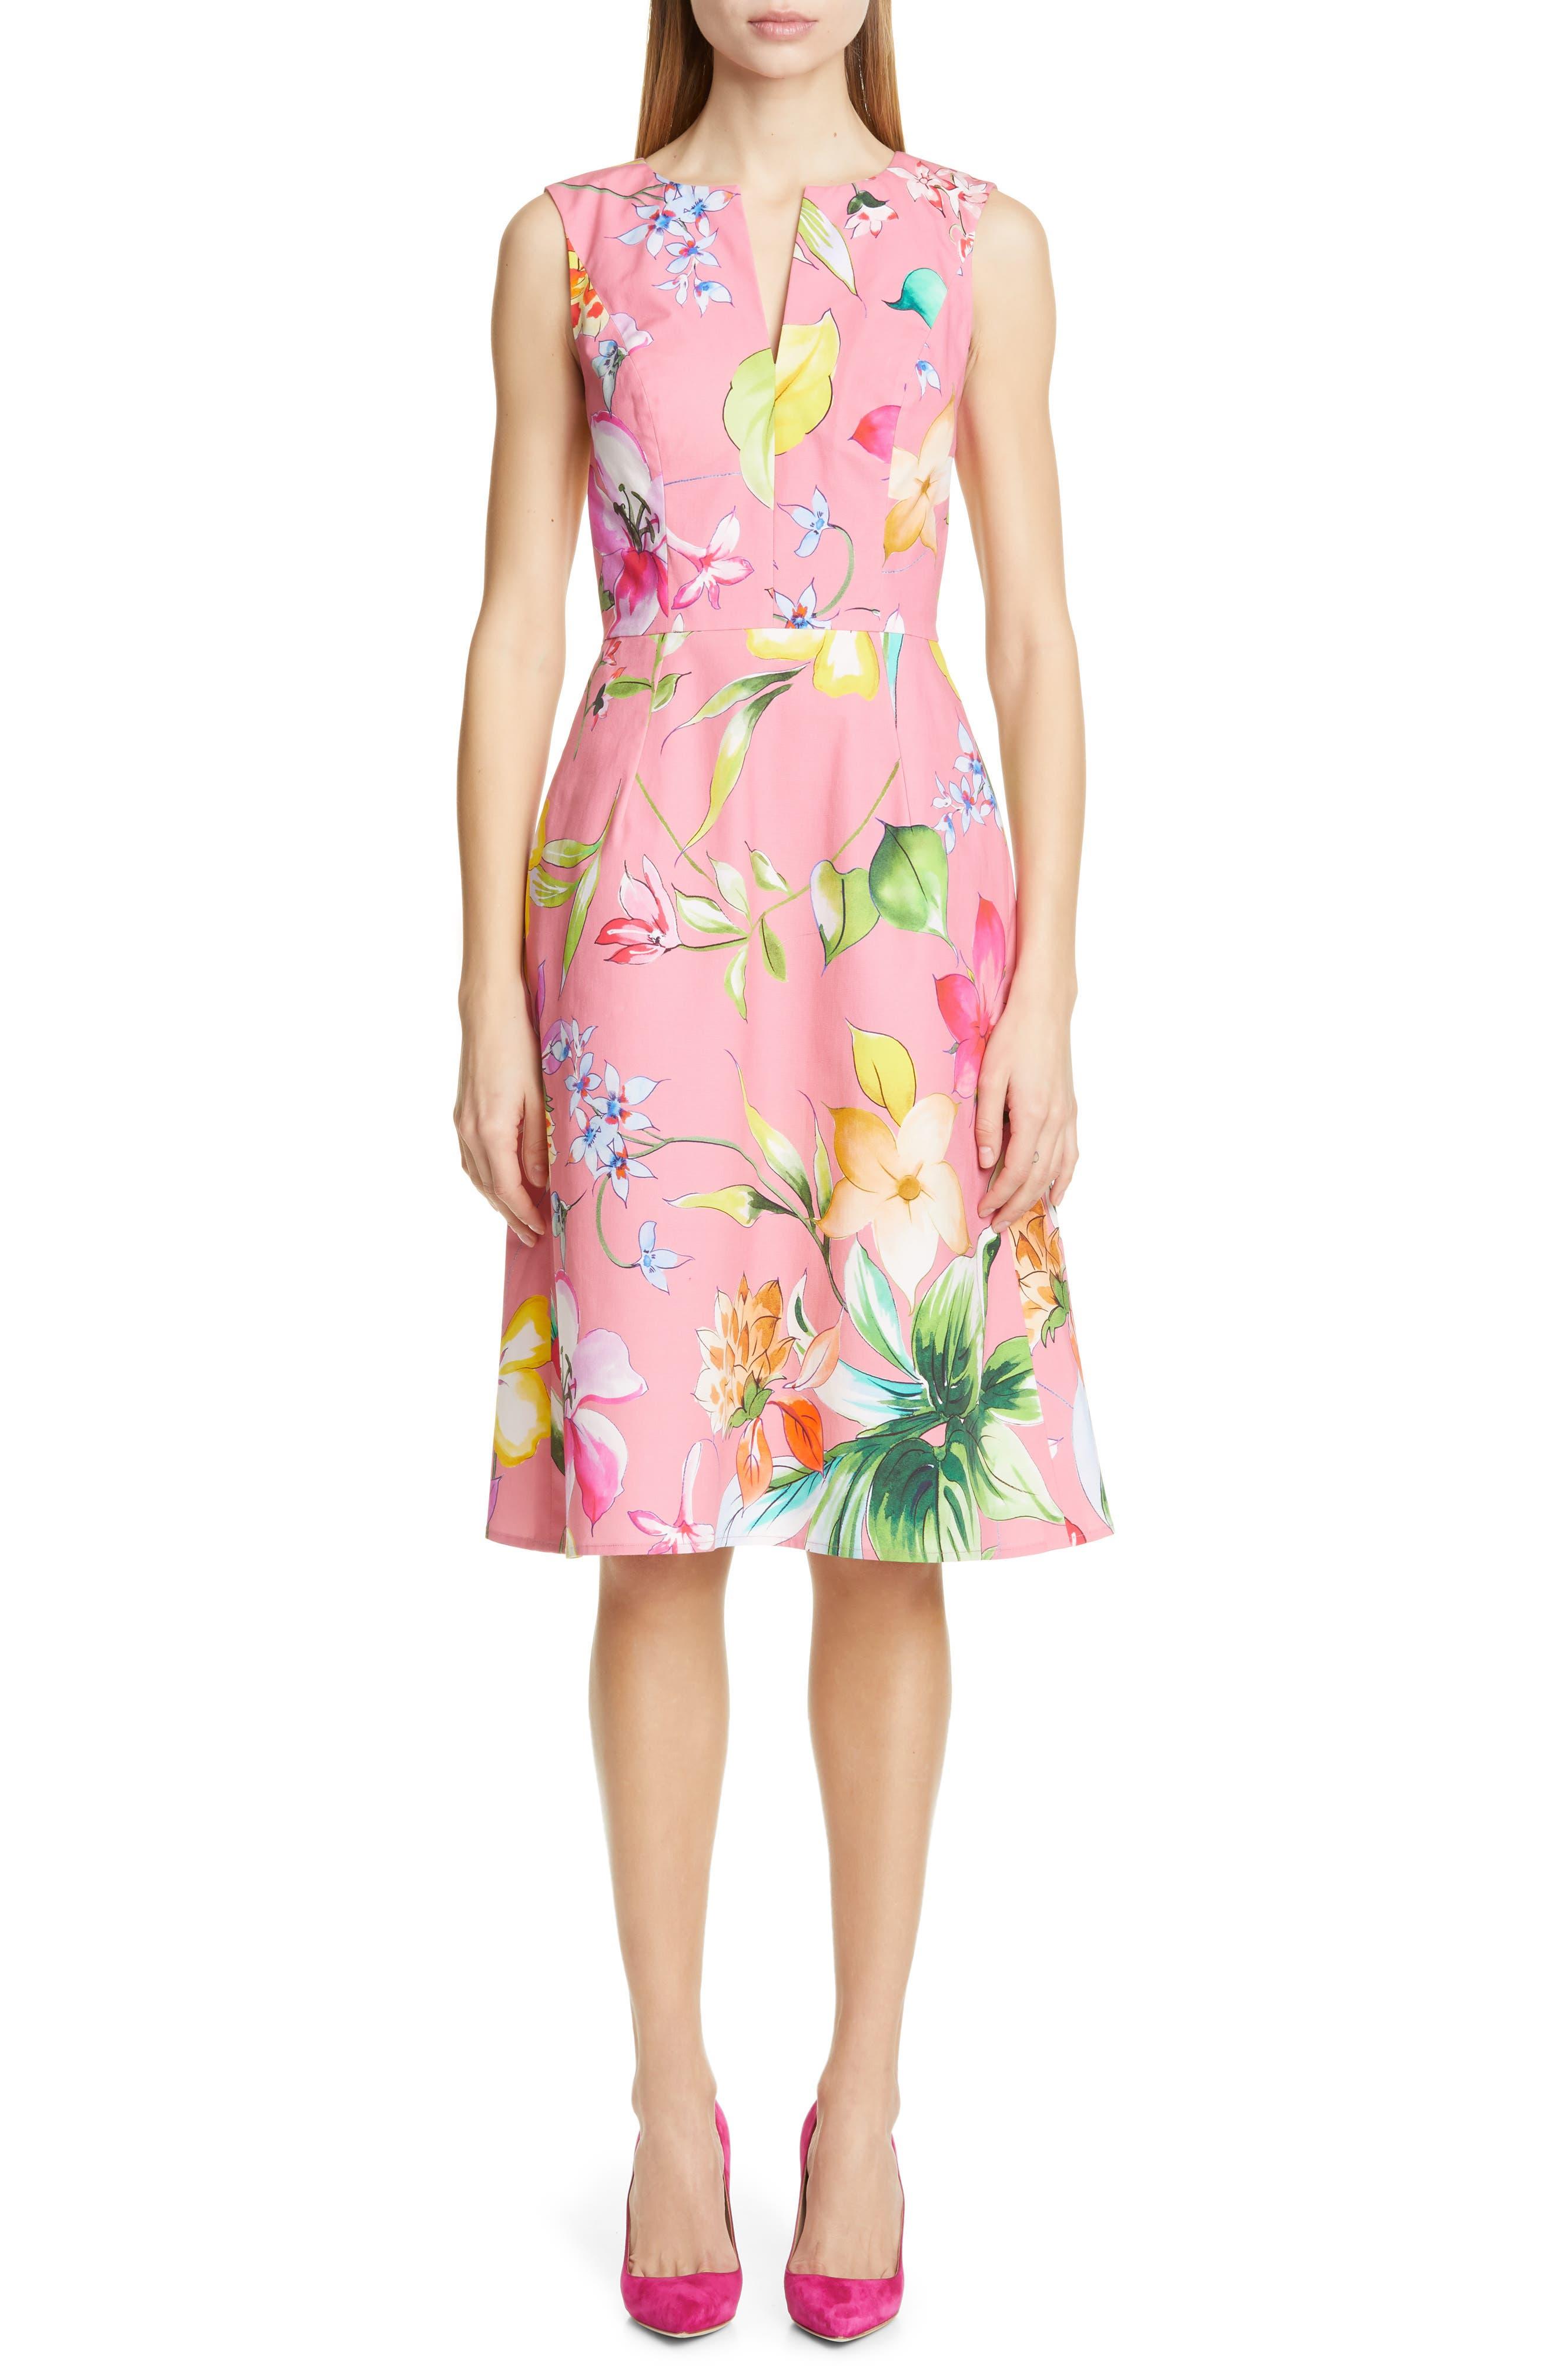 Carolina Herrera Floral Cocktail Dress